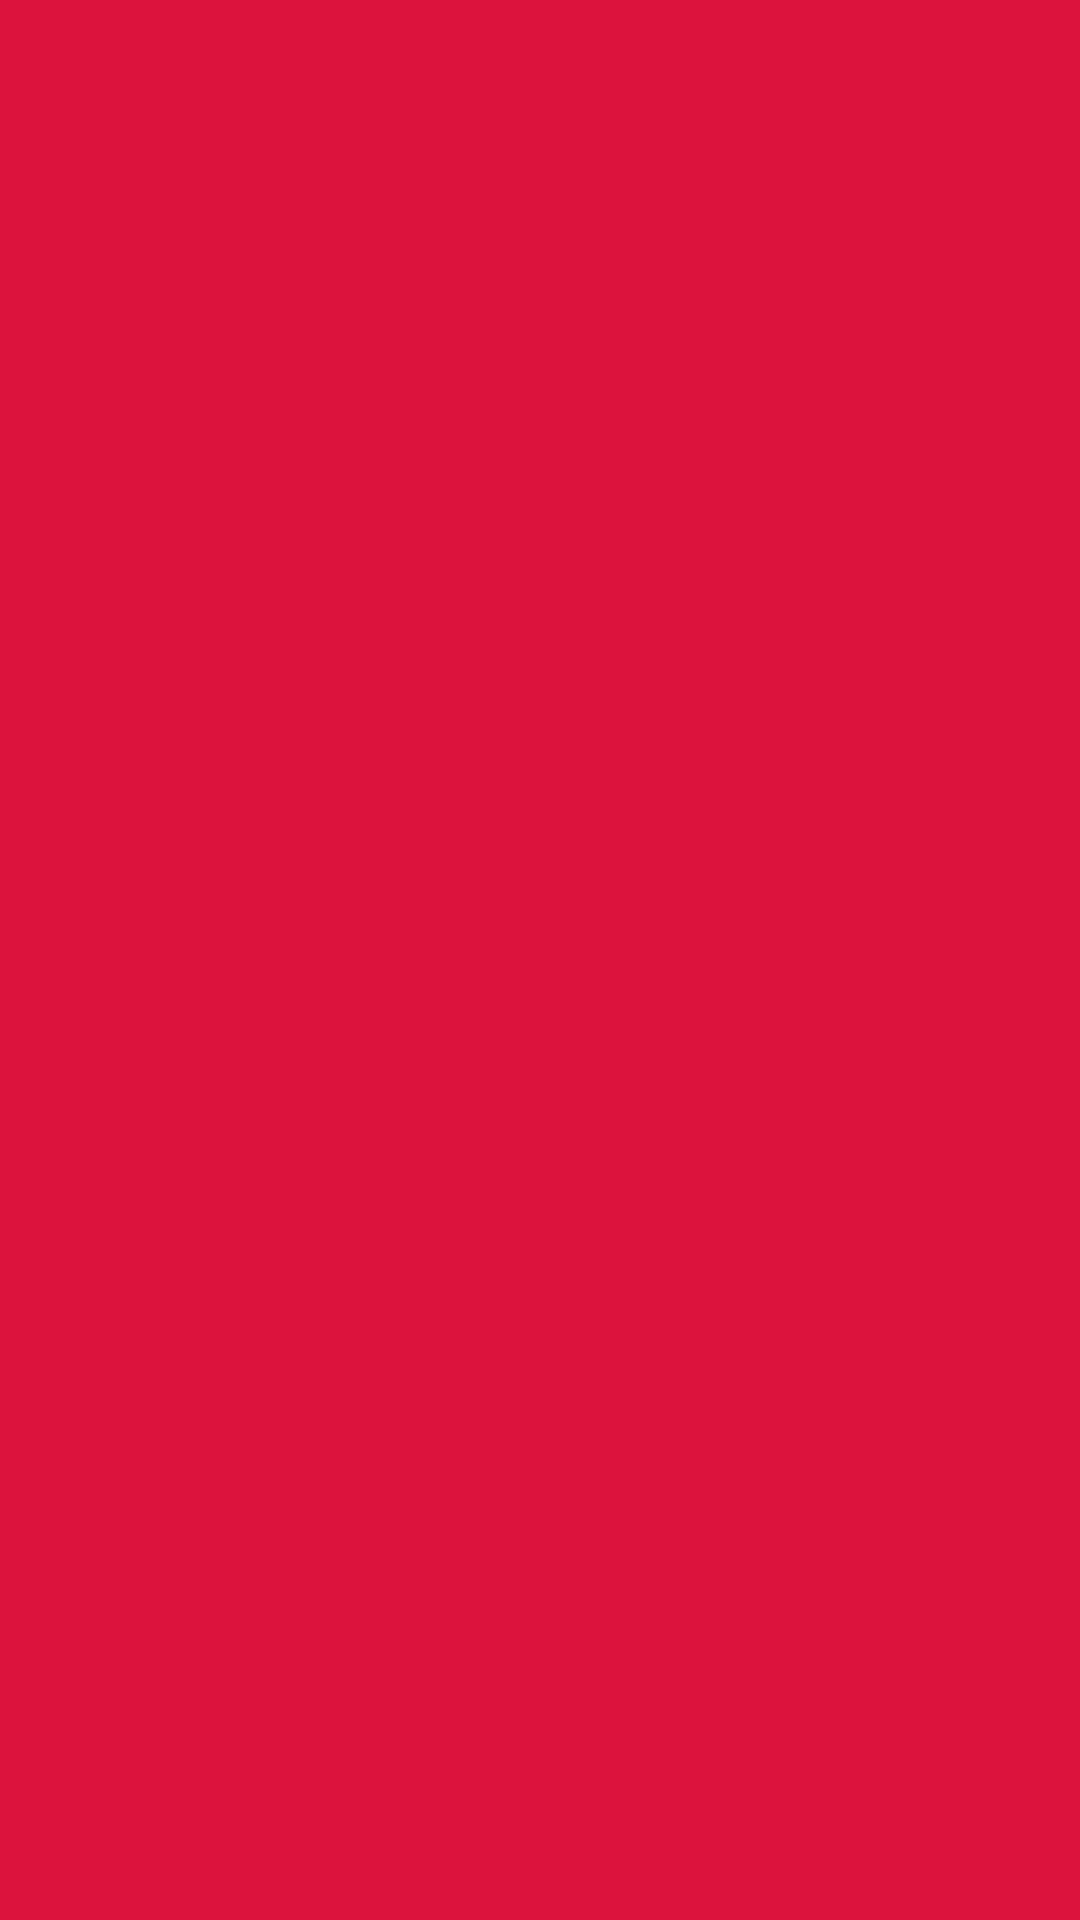 1080x1920 Crimson Solid Color Background